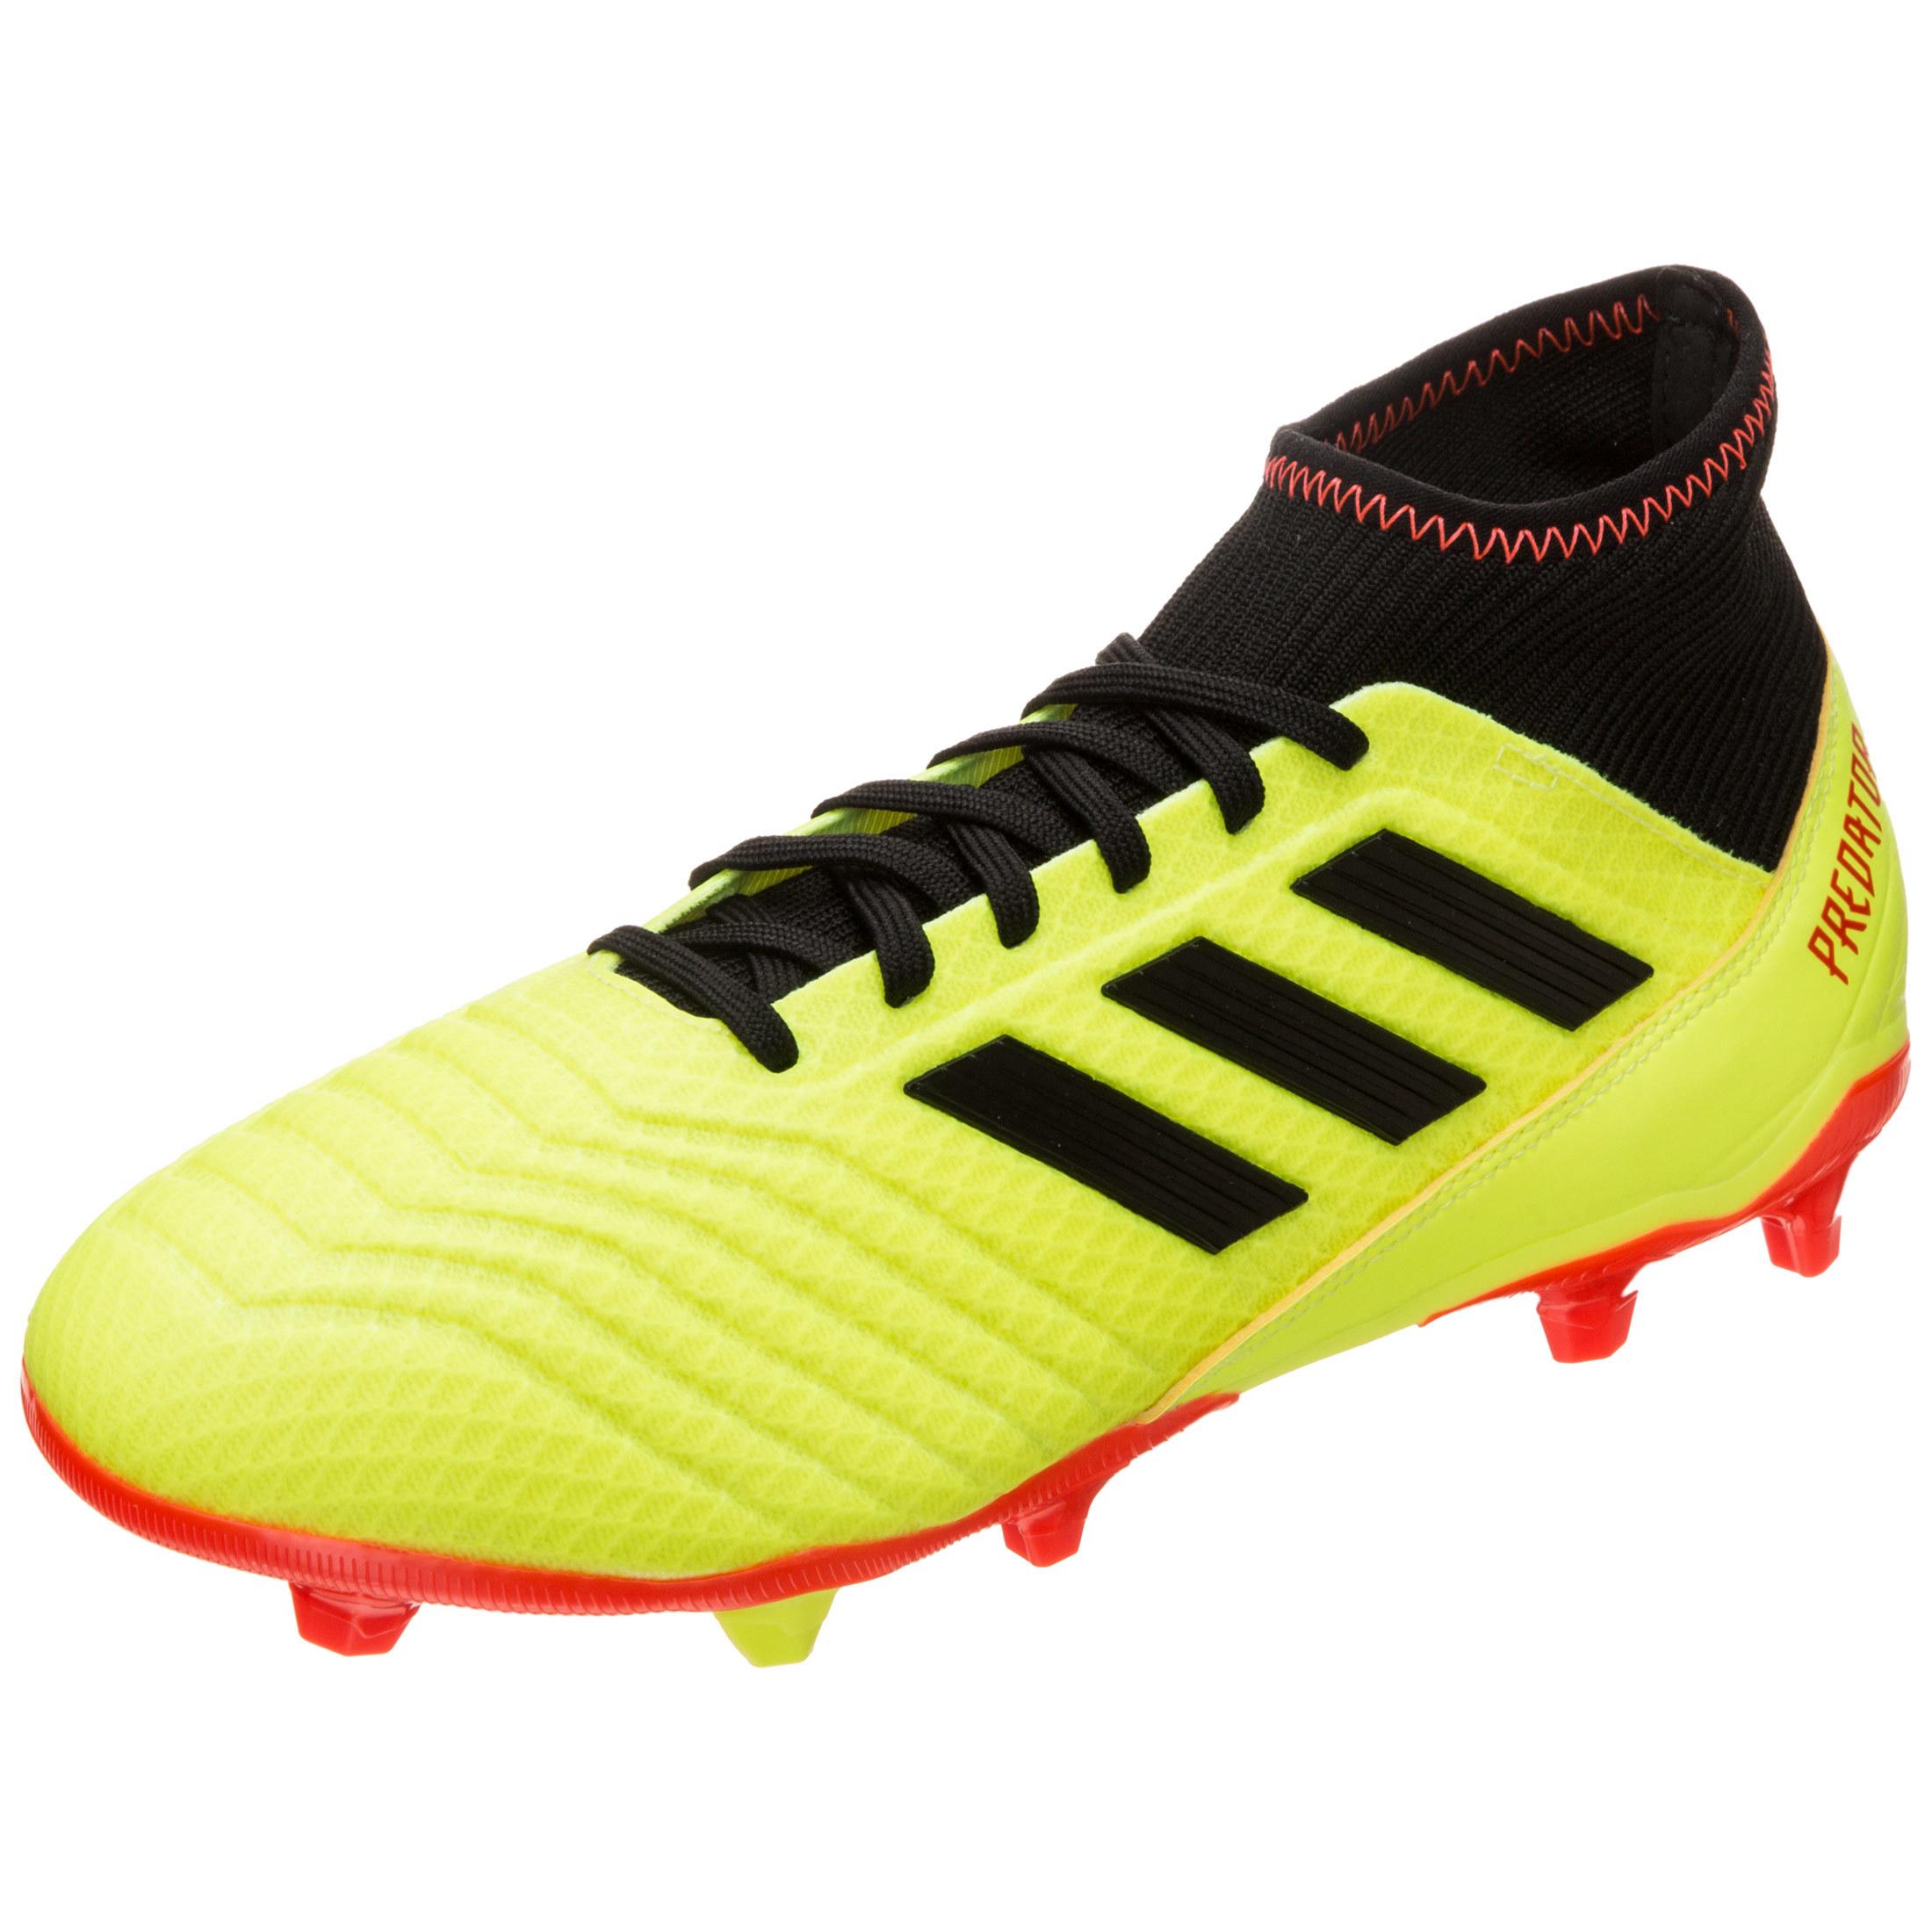 8844818eb764 adidas Predator 18.3 Firm Ground Boots